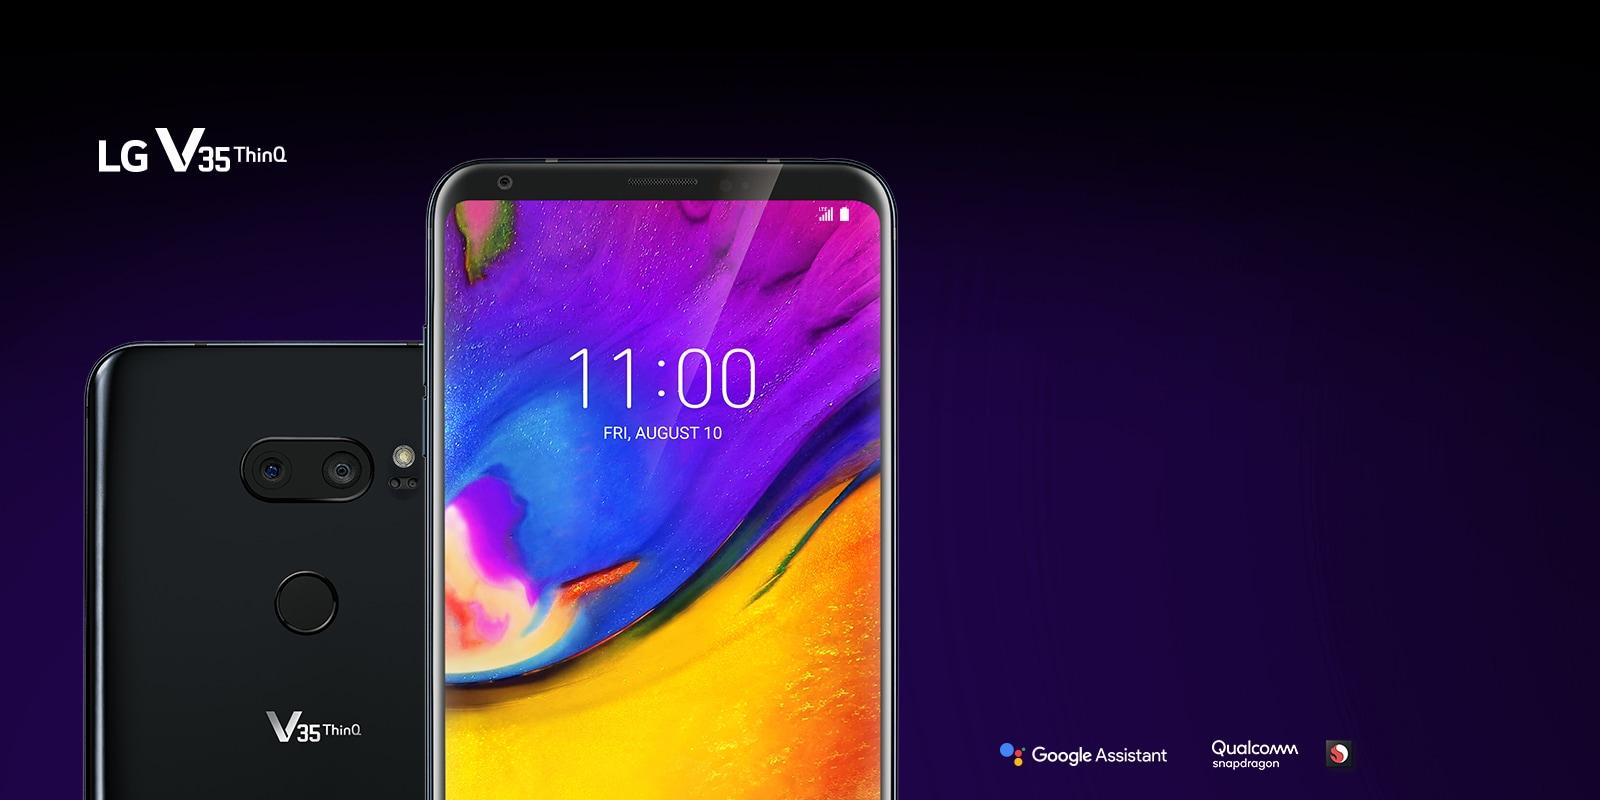 e2372c533b2 Celulares LG: Teléfonos Móviles | LG Centroamérica y Caribe